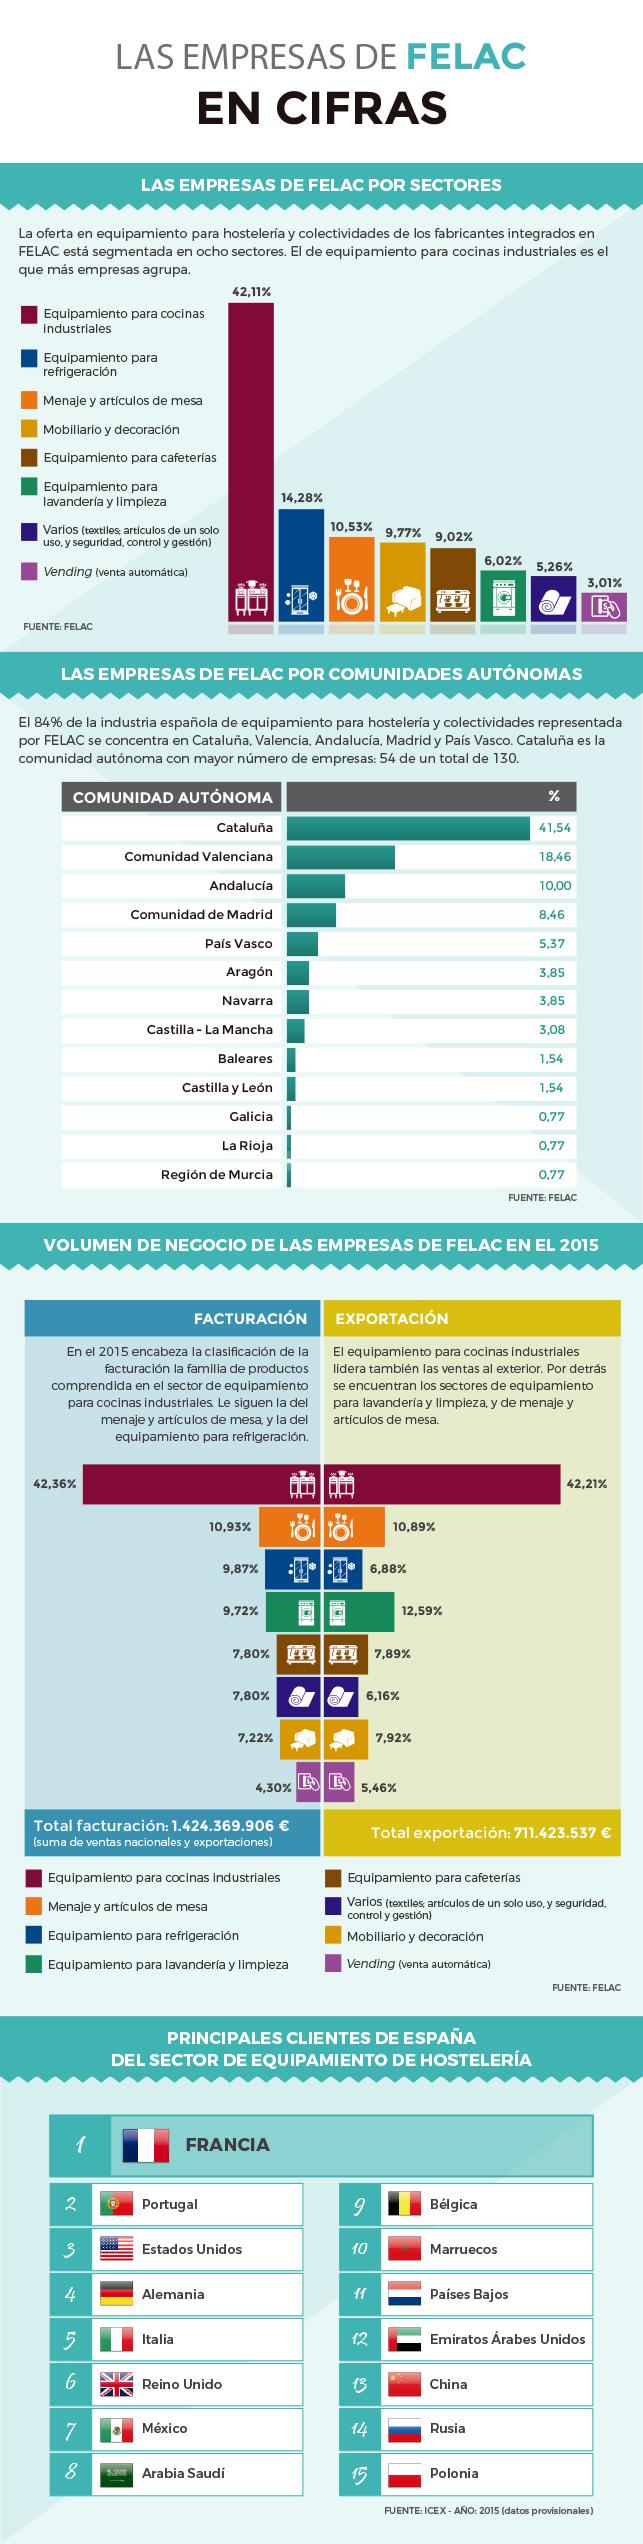 infografia-informe